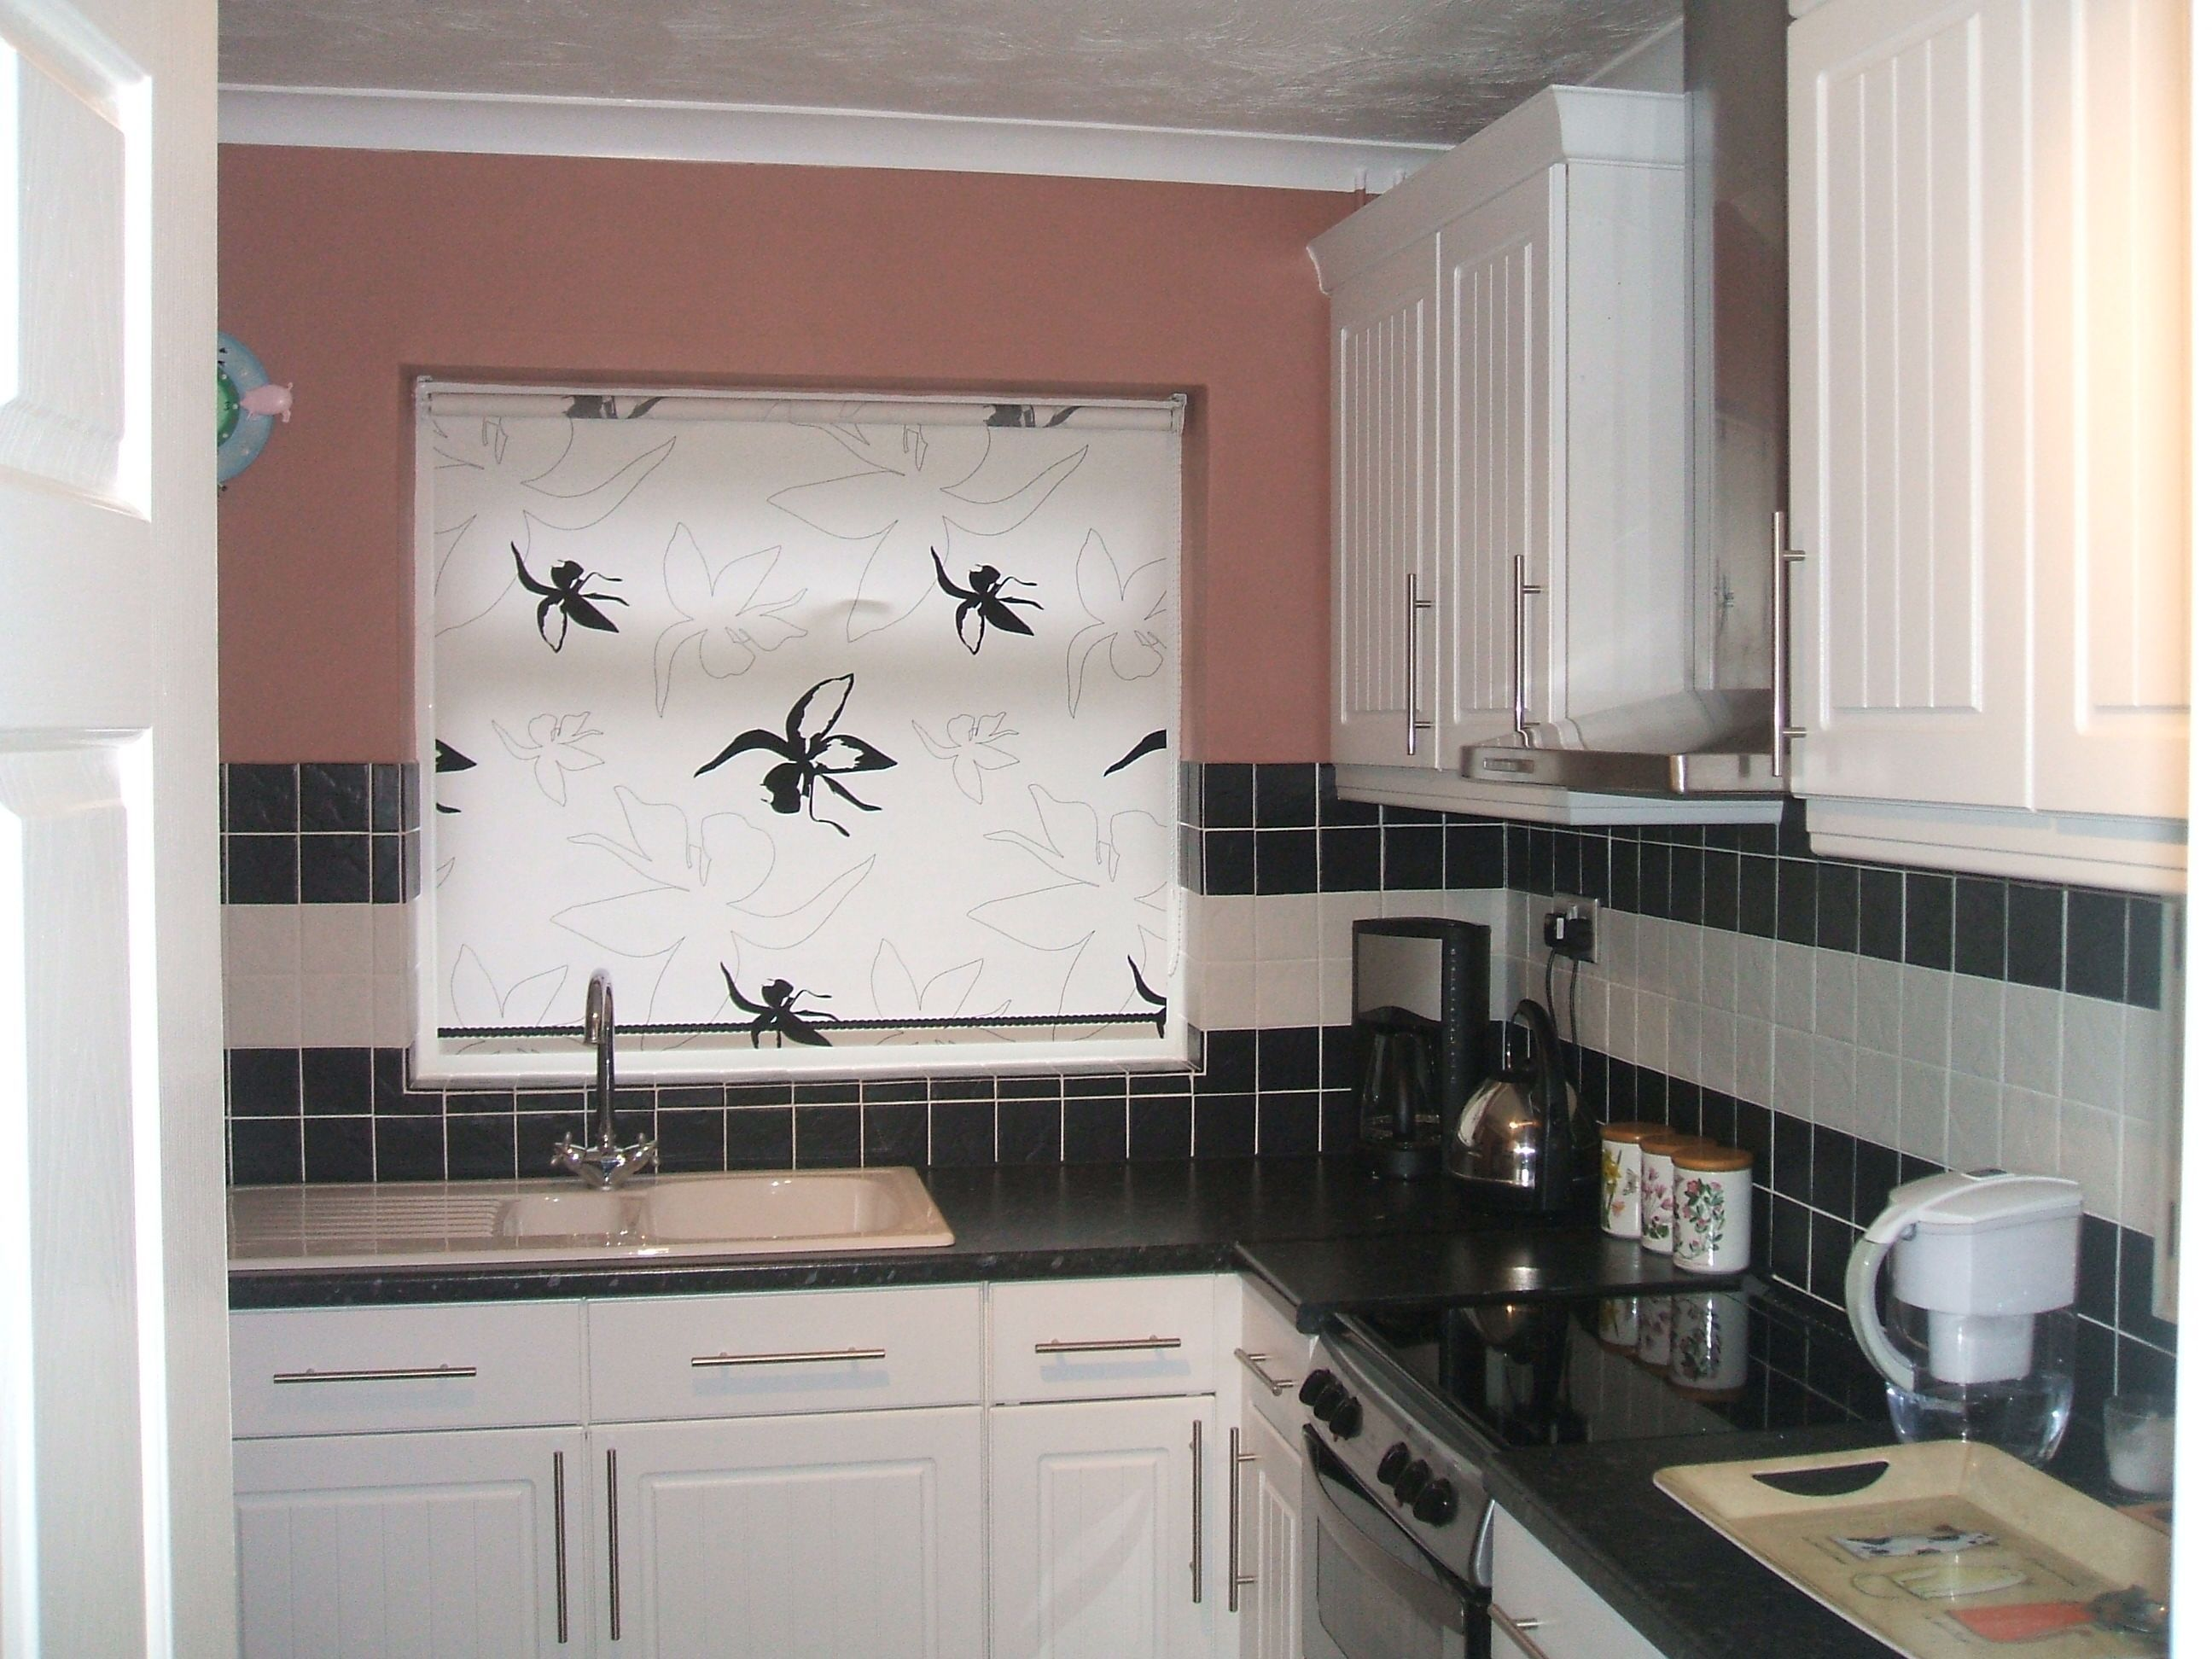 Bathroom blinds indoor shutters privacy blinds shuttersblinds and